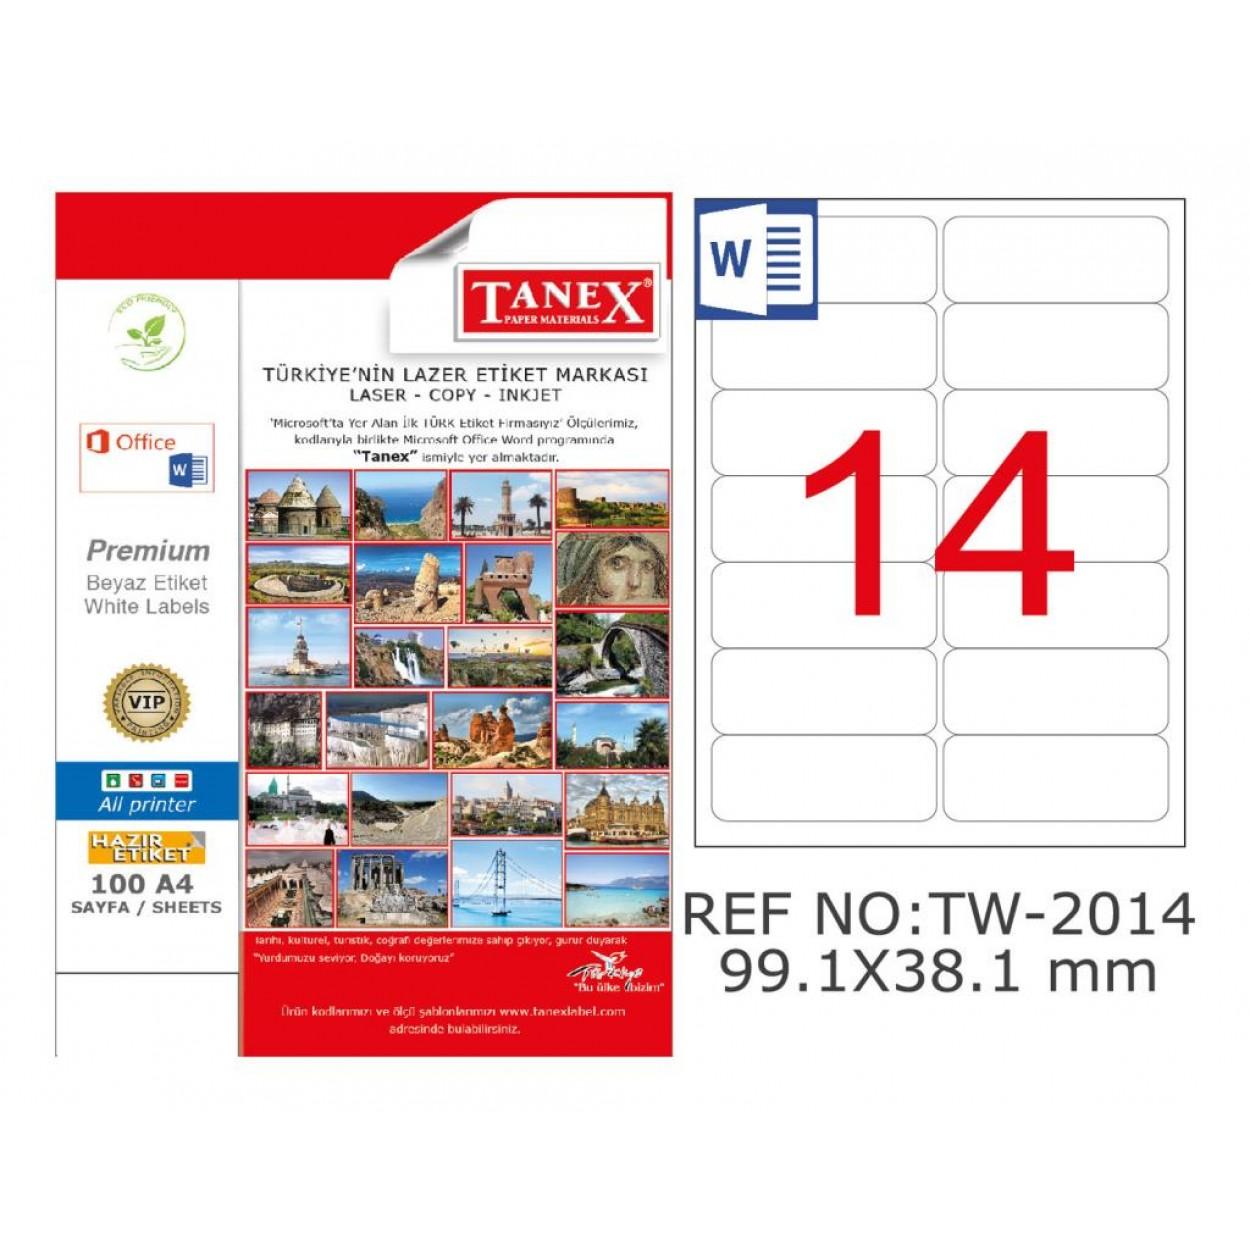 Tanex TW-2014 99.1x34.1mm Kuşe Laser Etiket 1400 Adet